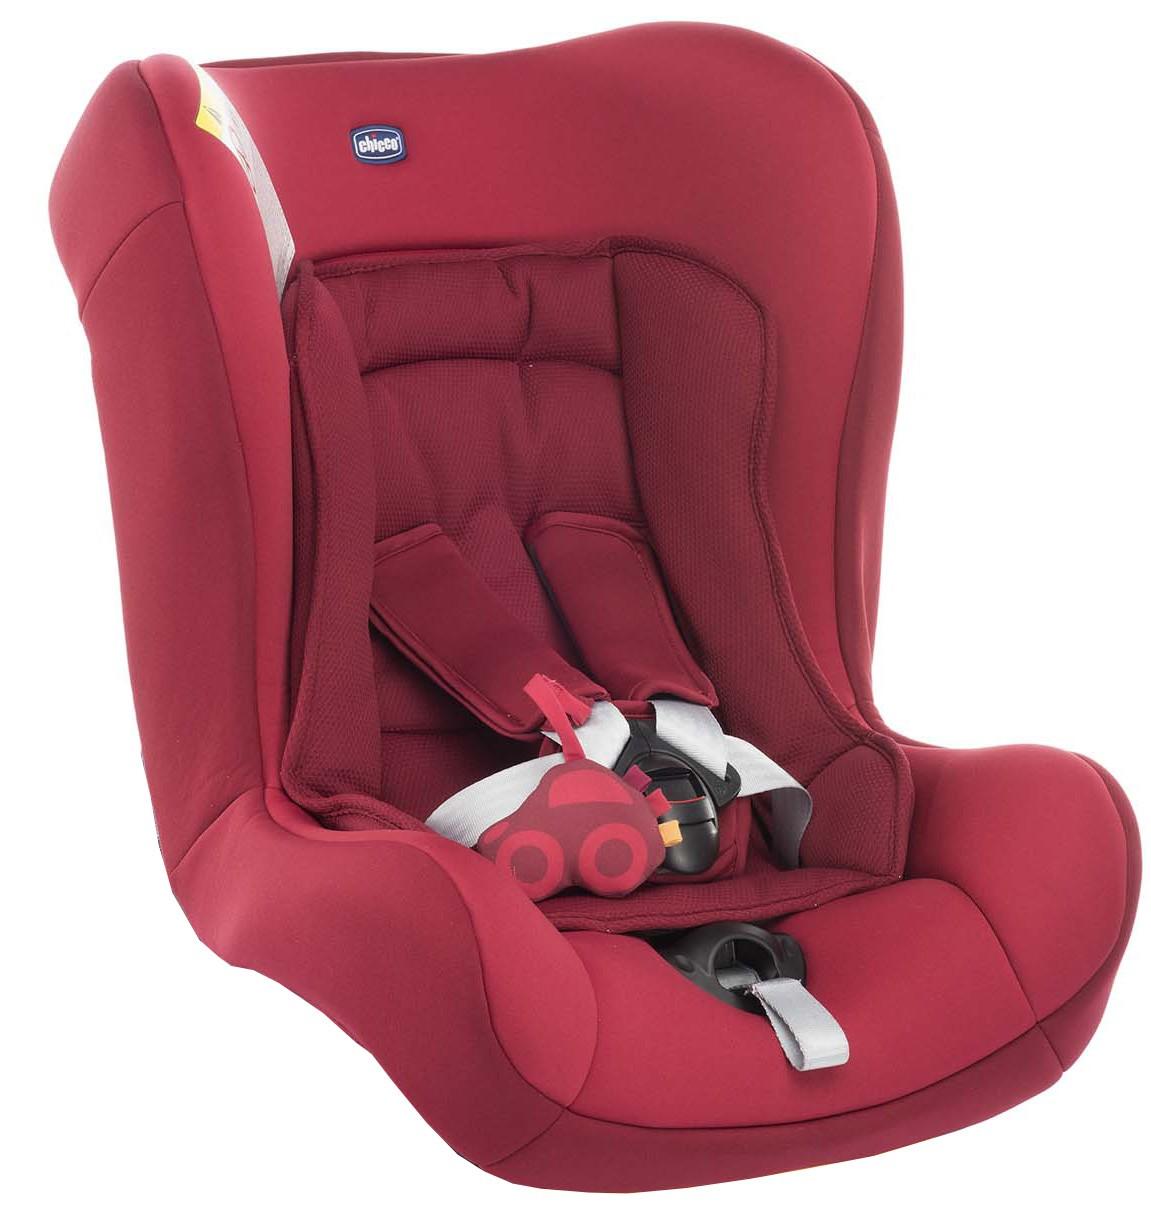 Chicco Bezug für Kindersitz Cosmos Red